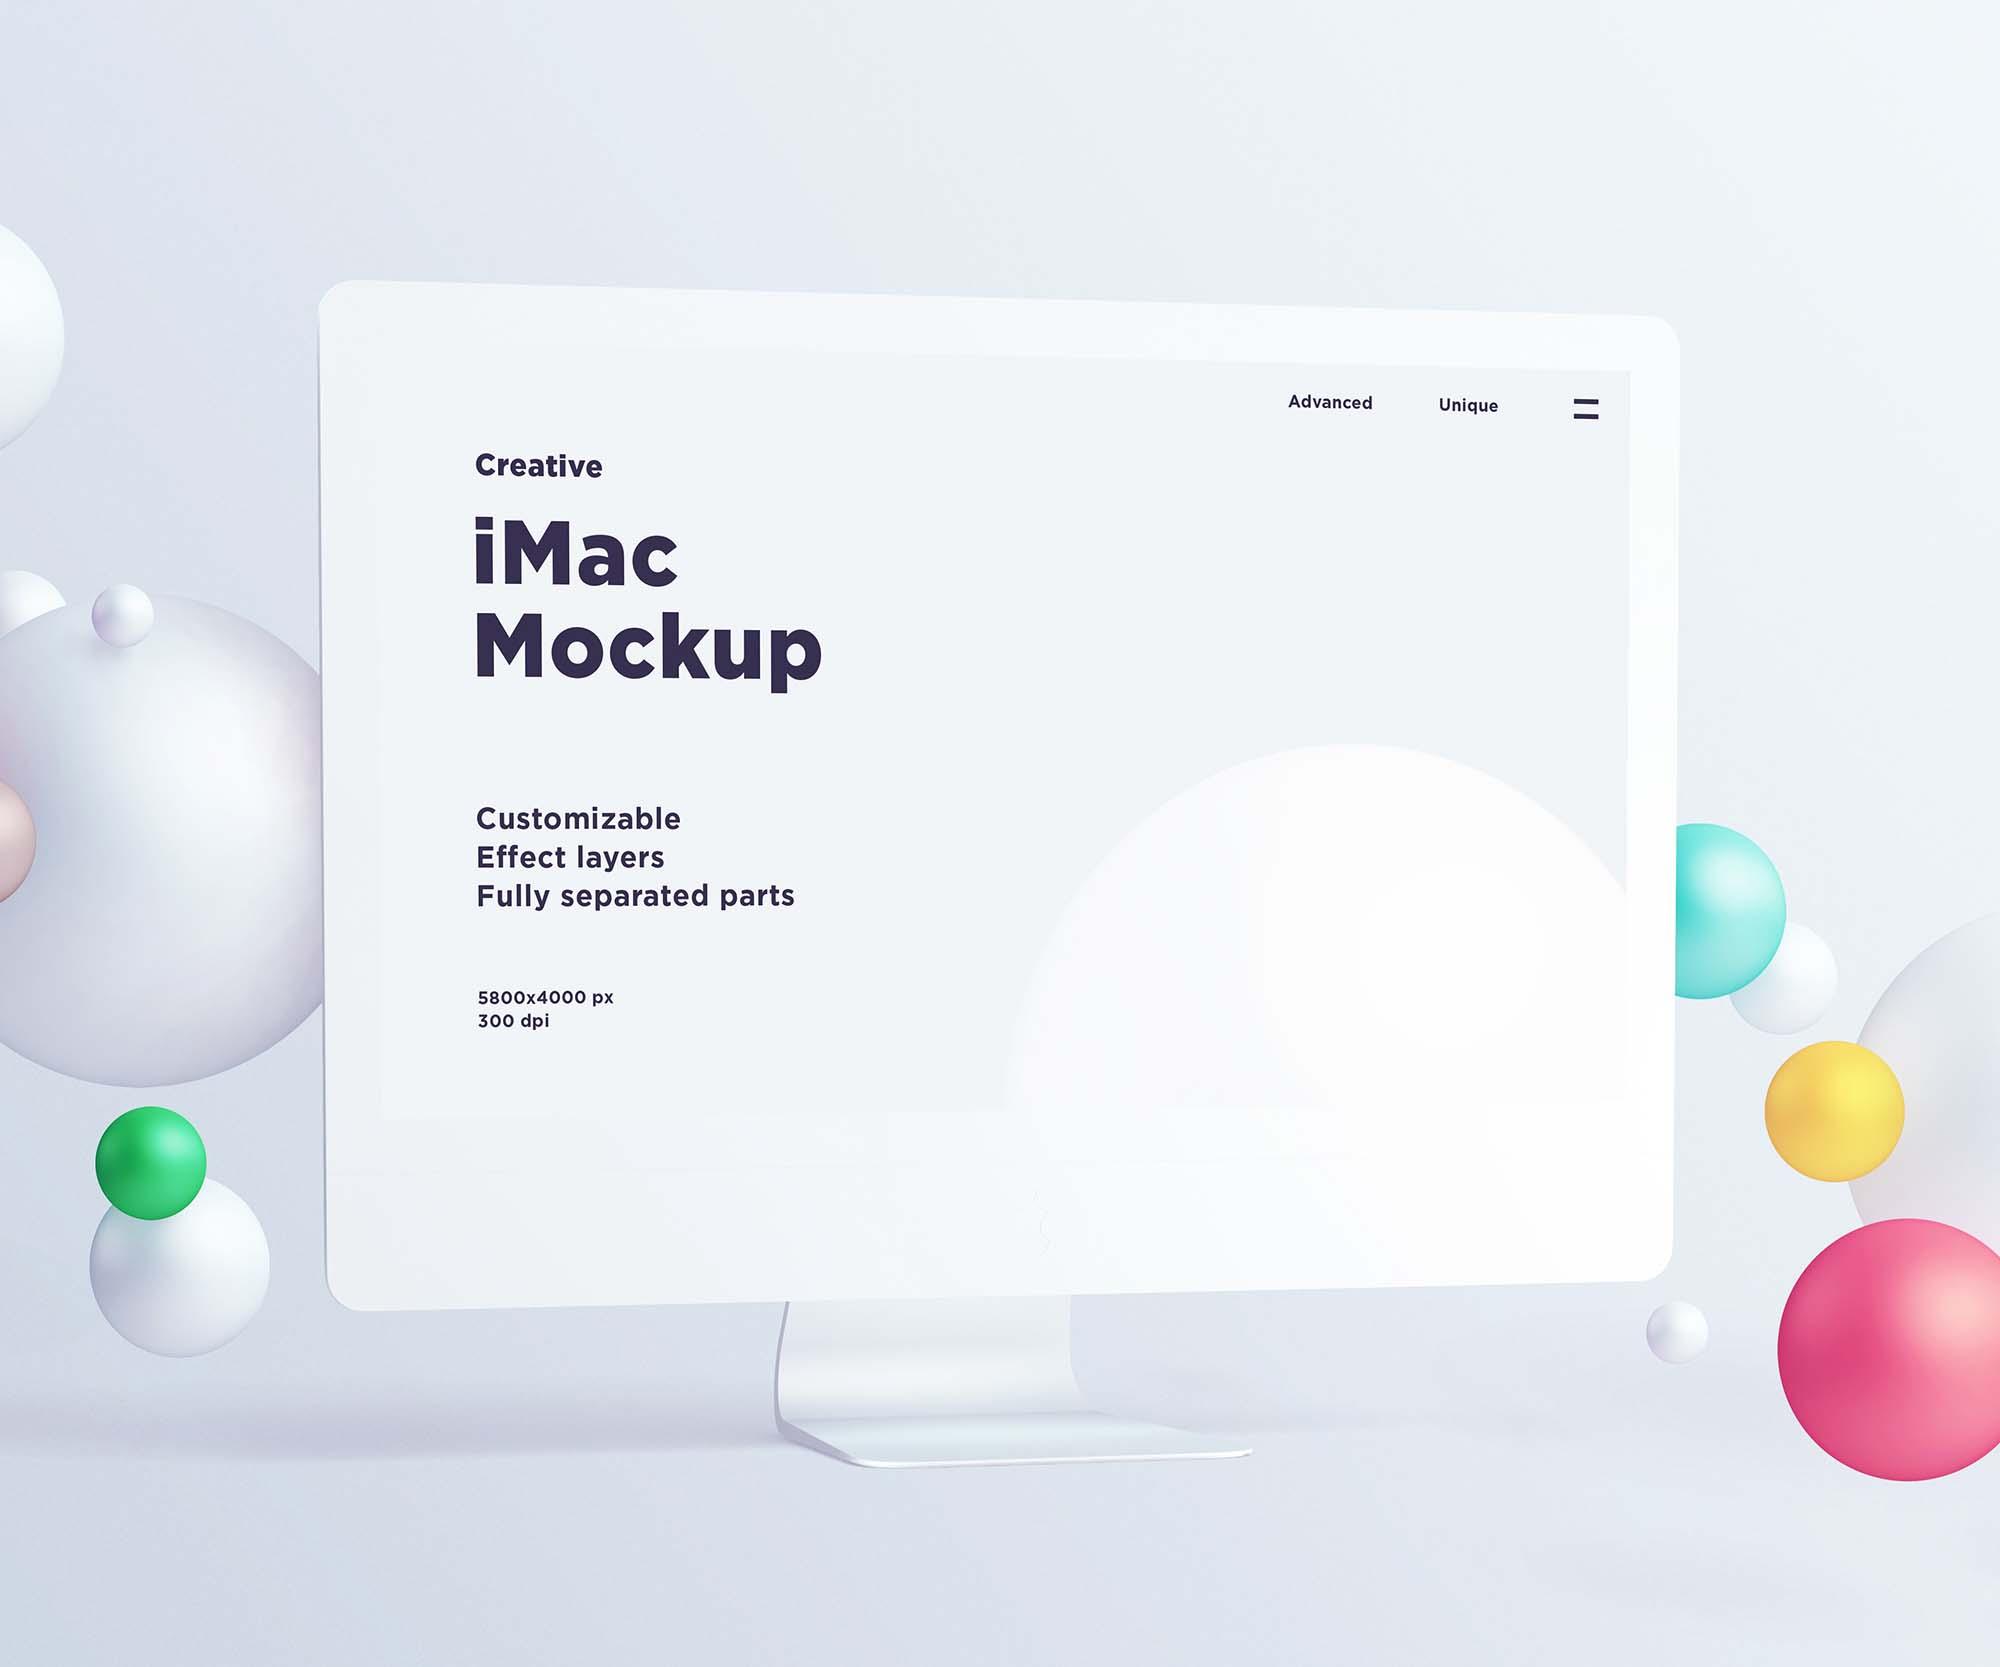 iMac with Spheres Mockup